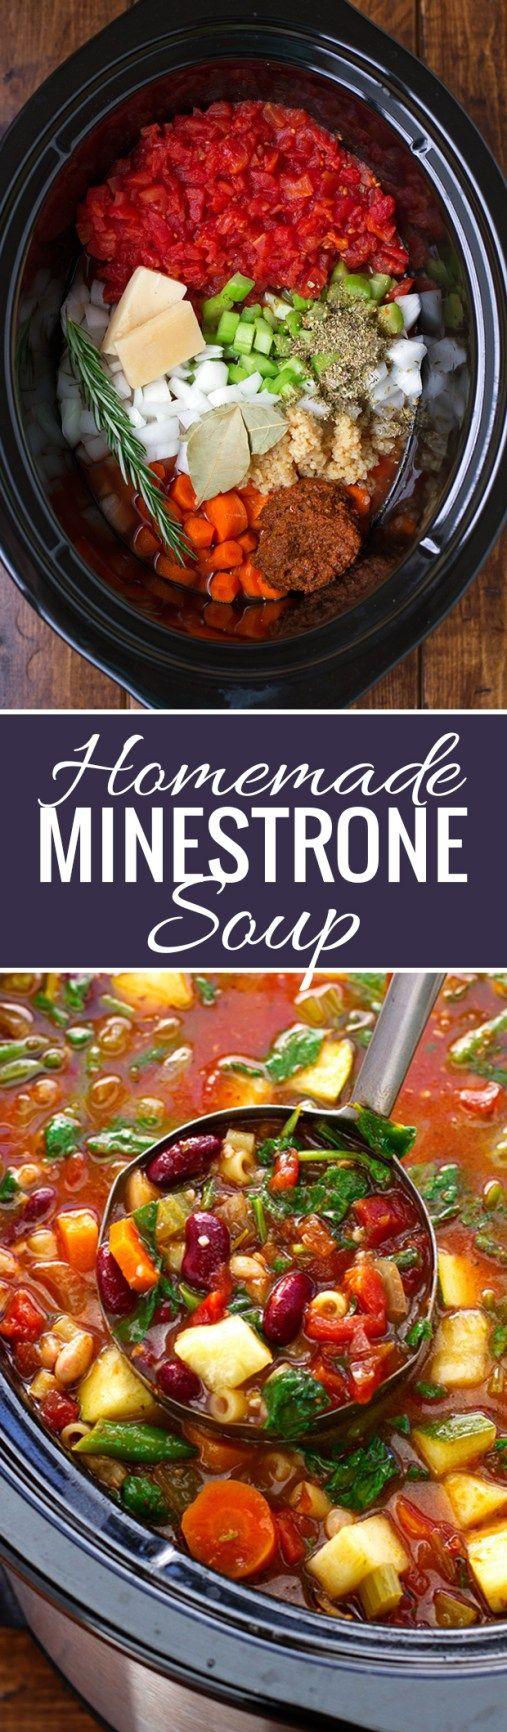 Homemade Minestrone Soup {Slow Cooker} | LIttlespicejar.com